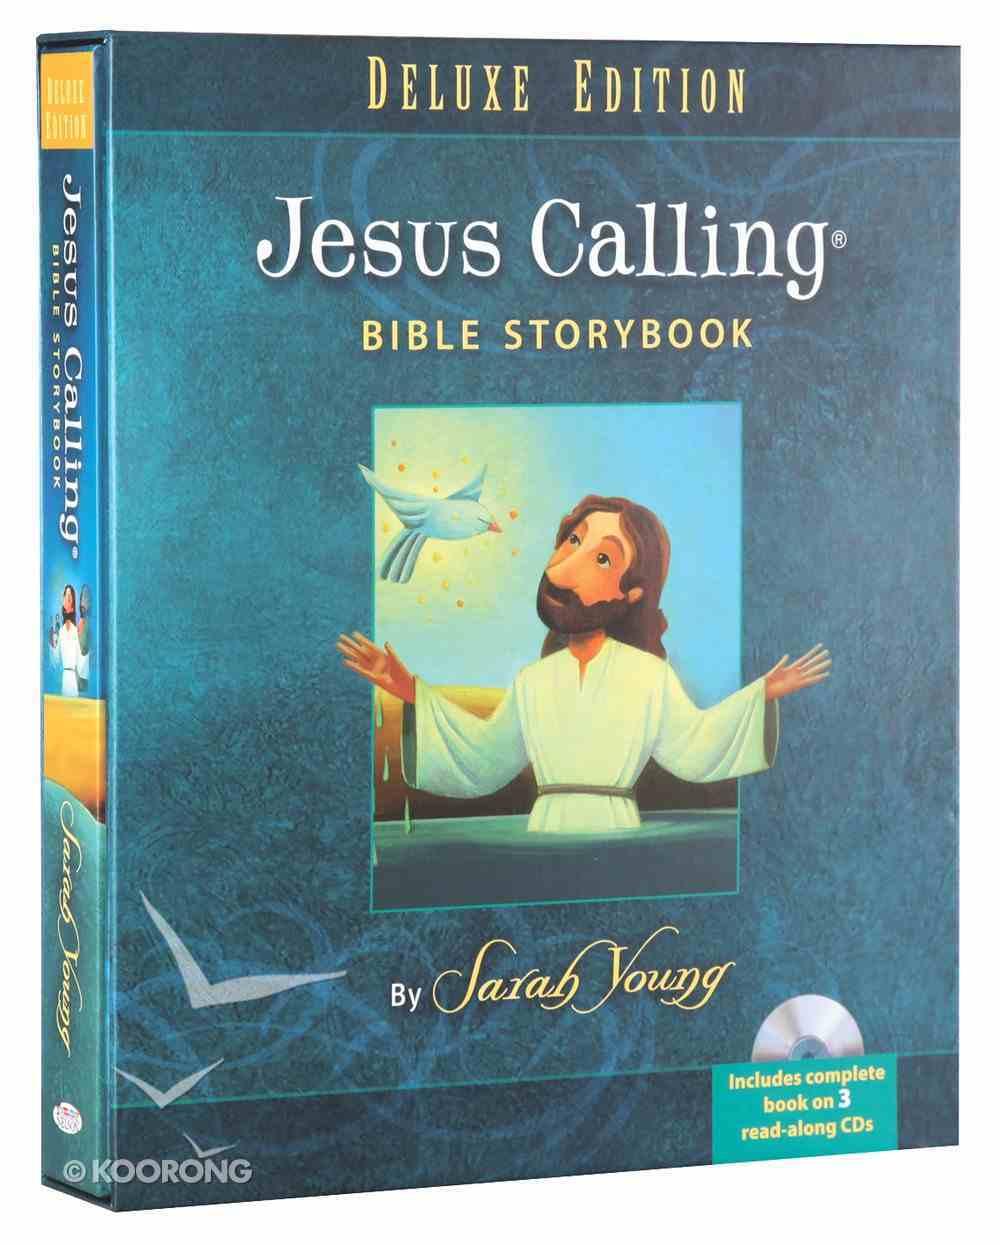 Jesus Calling Bible Storybook Deluxe Edition (Includes Cd) Hardback